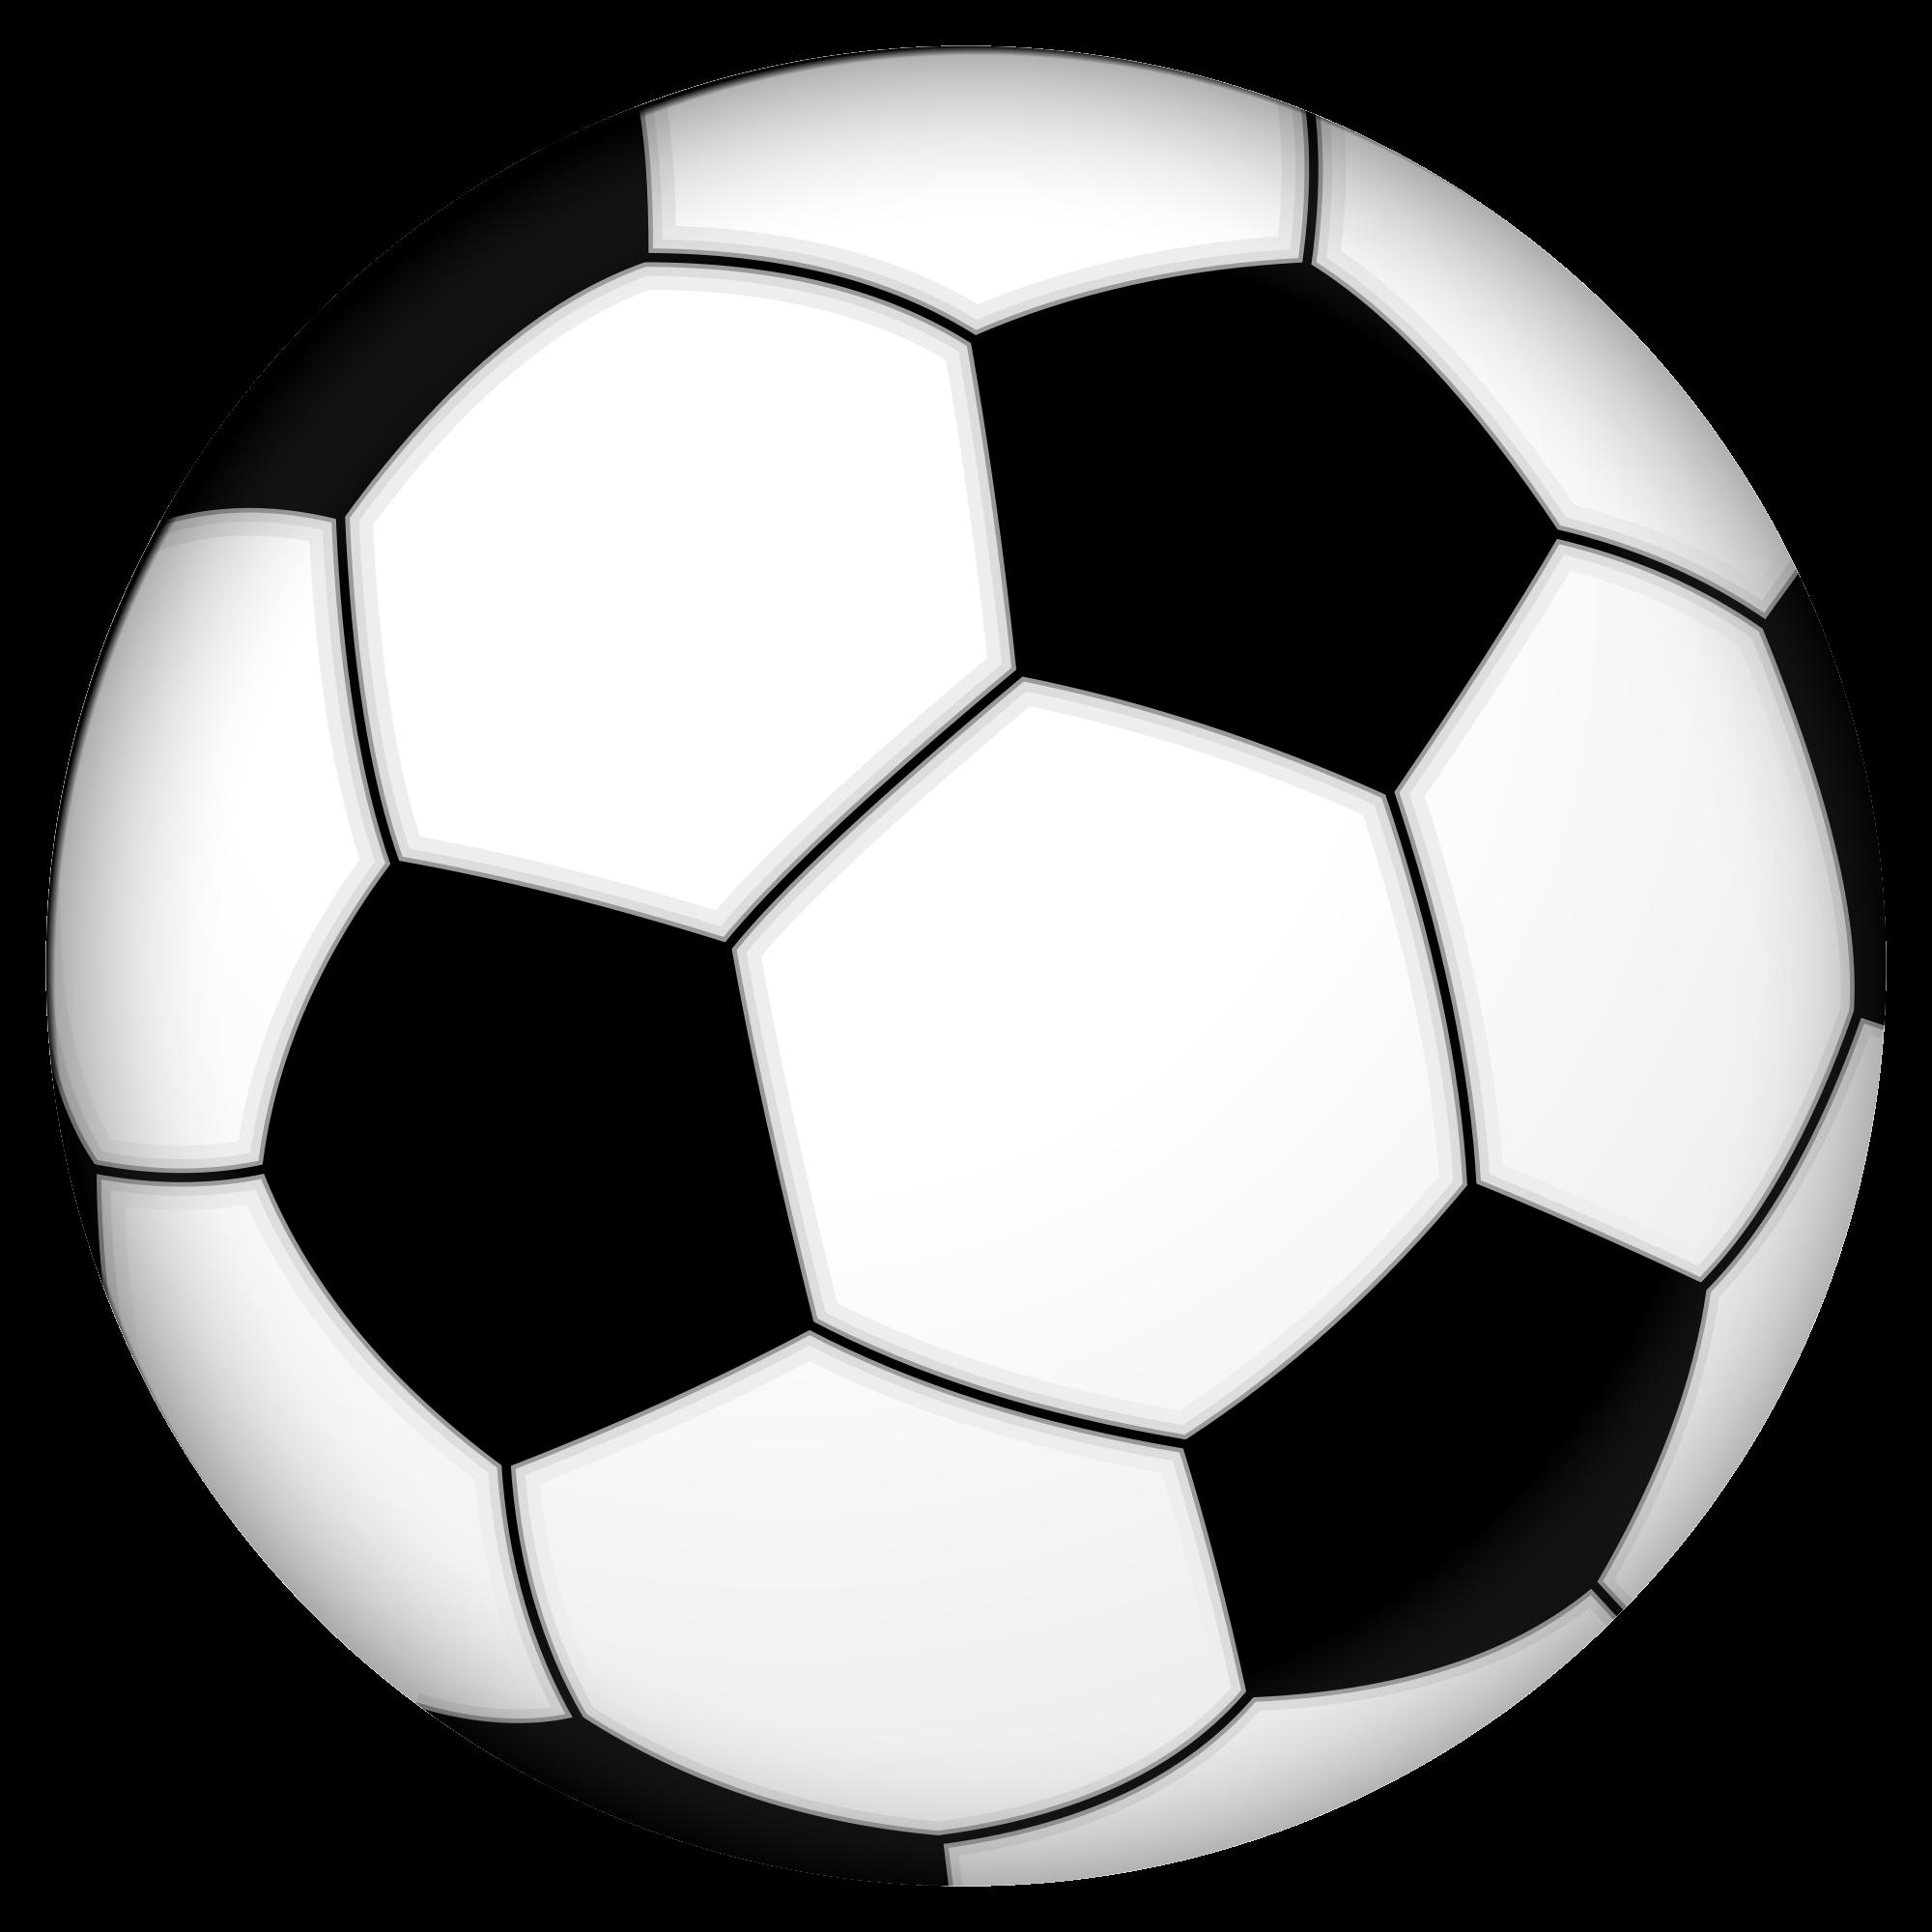 soccer-ball-clip-art-png-3.png (2000×2000)